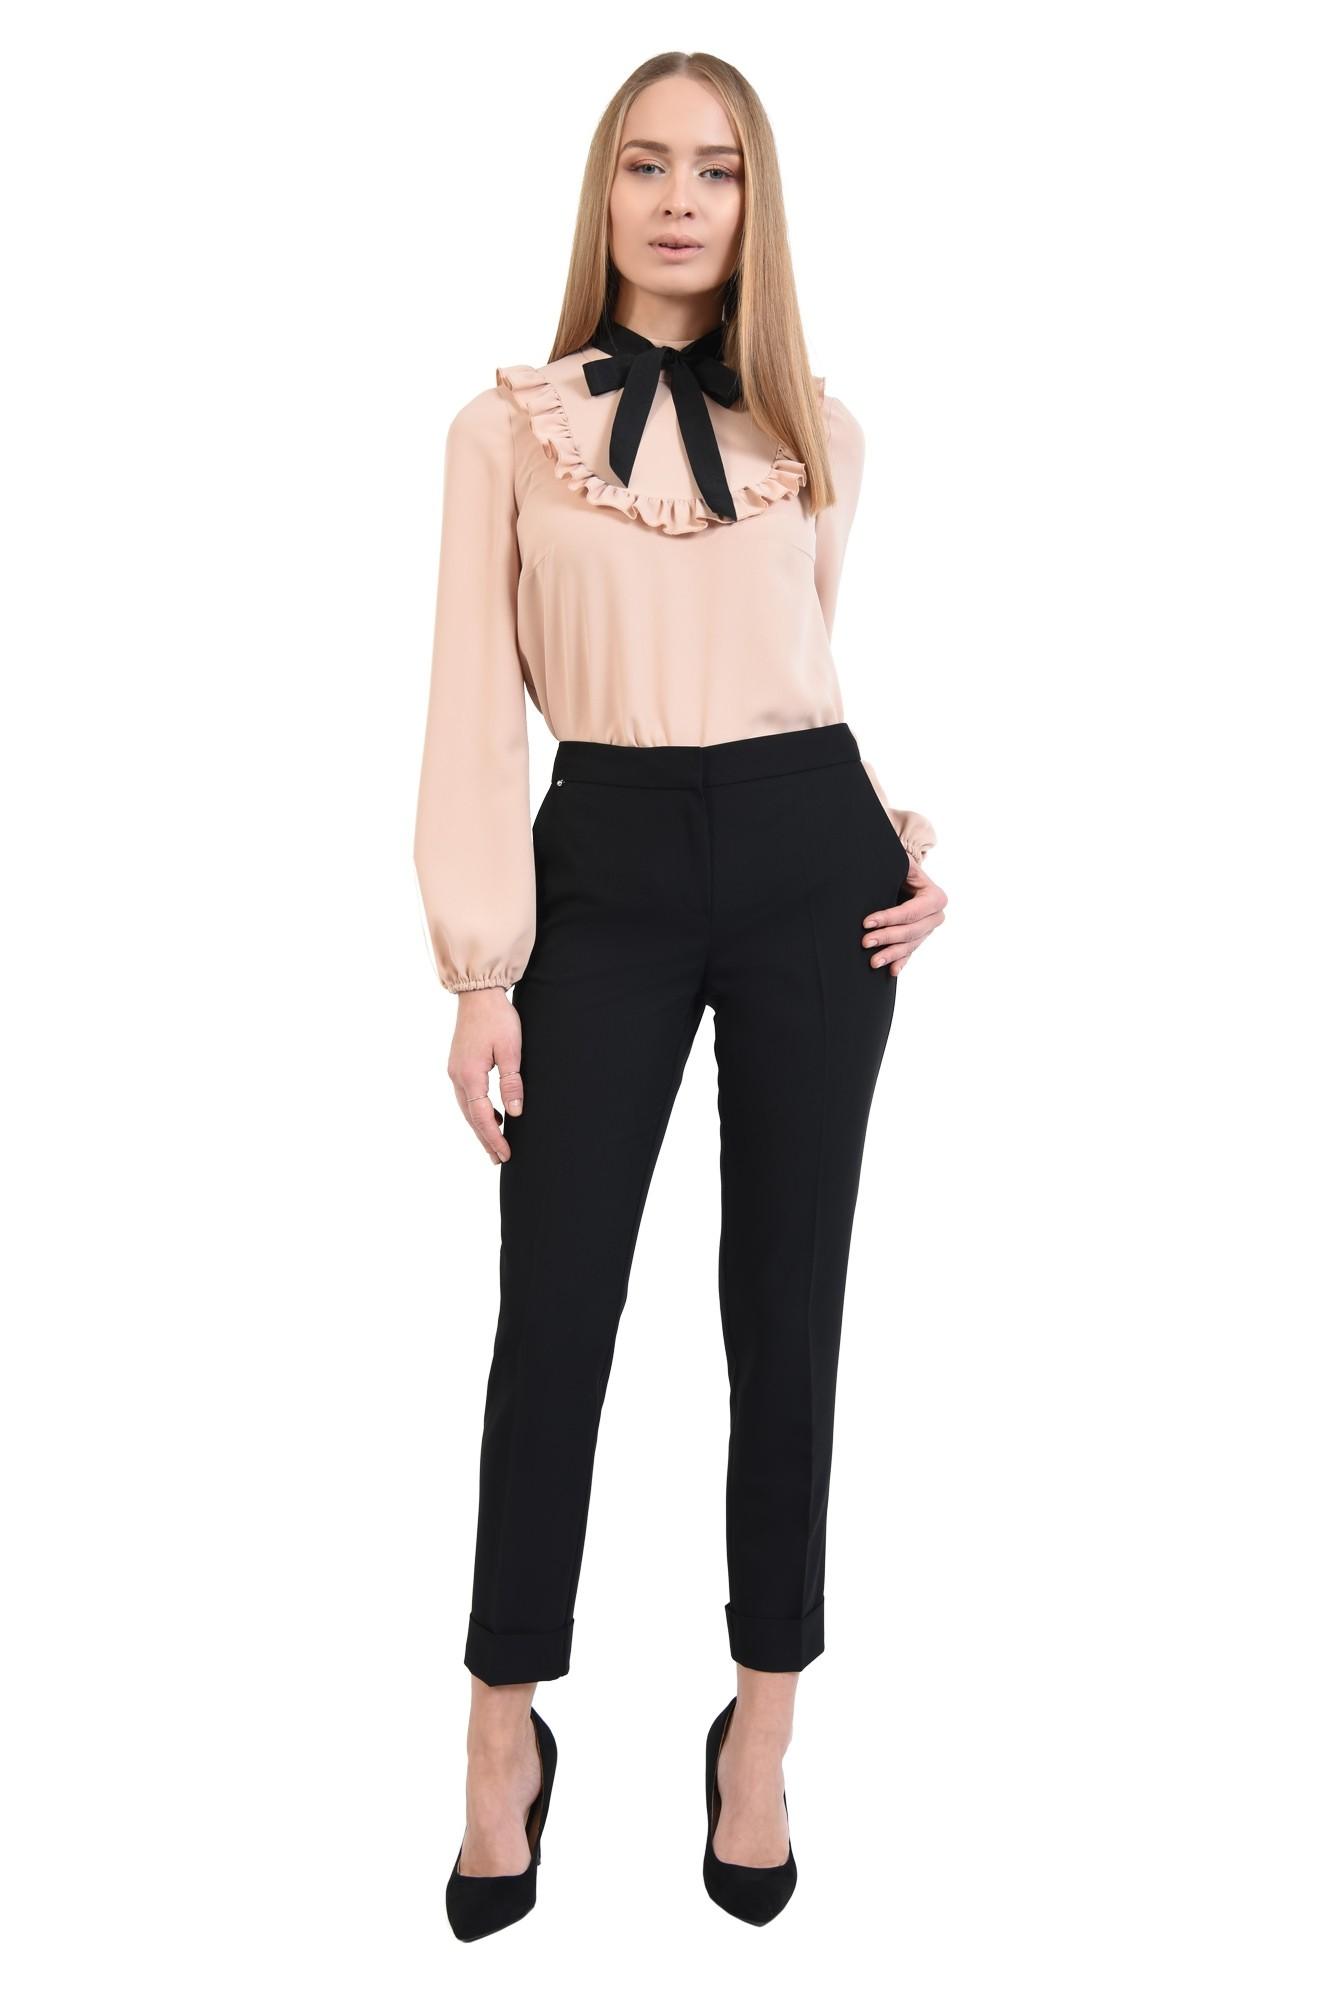 pantaloni tigareta, cu mansete, cu talie medie, buzunare